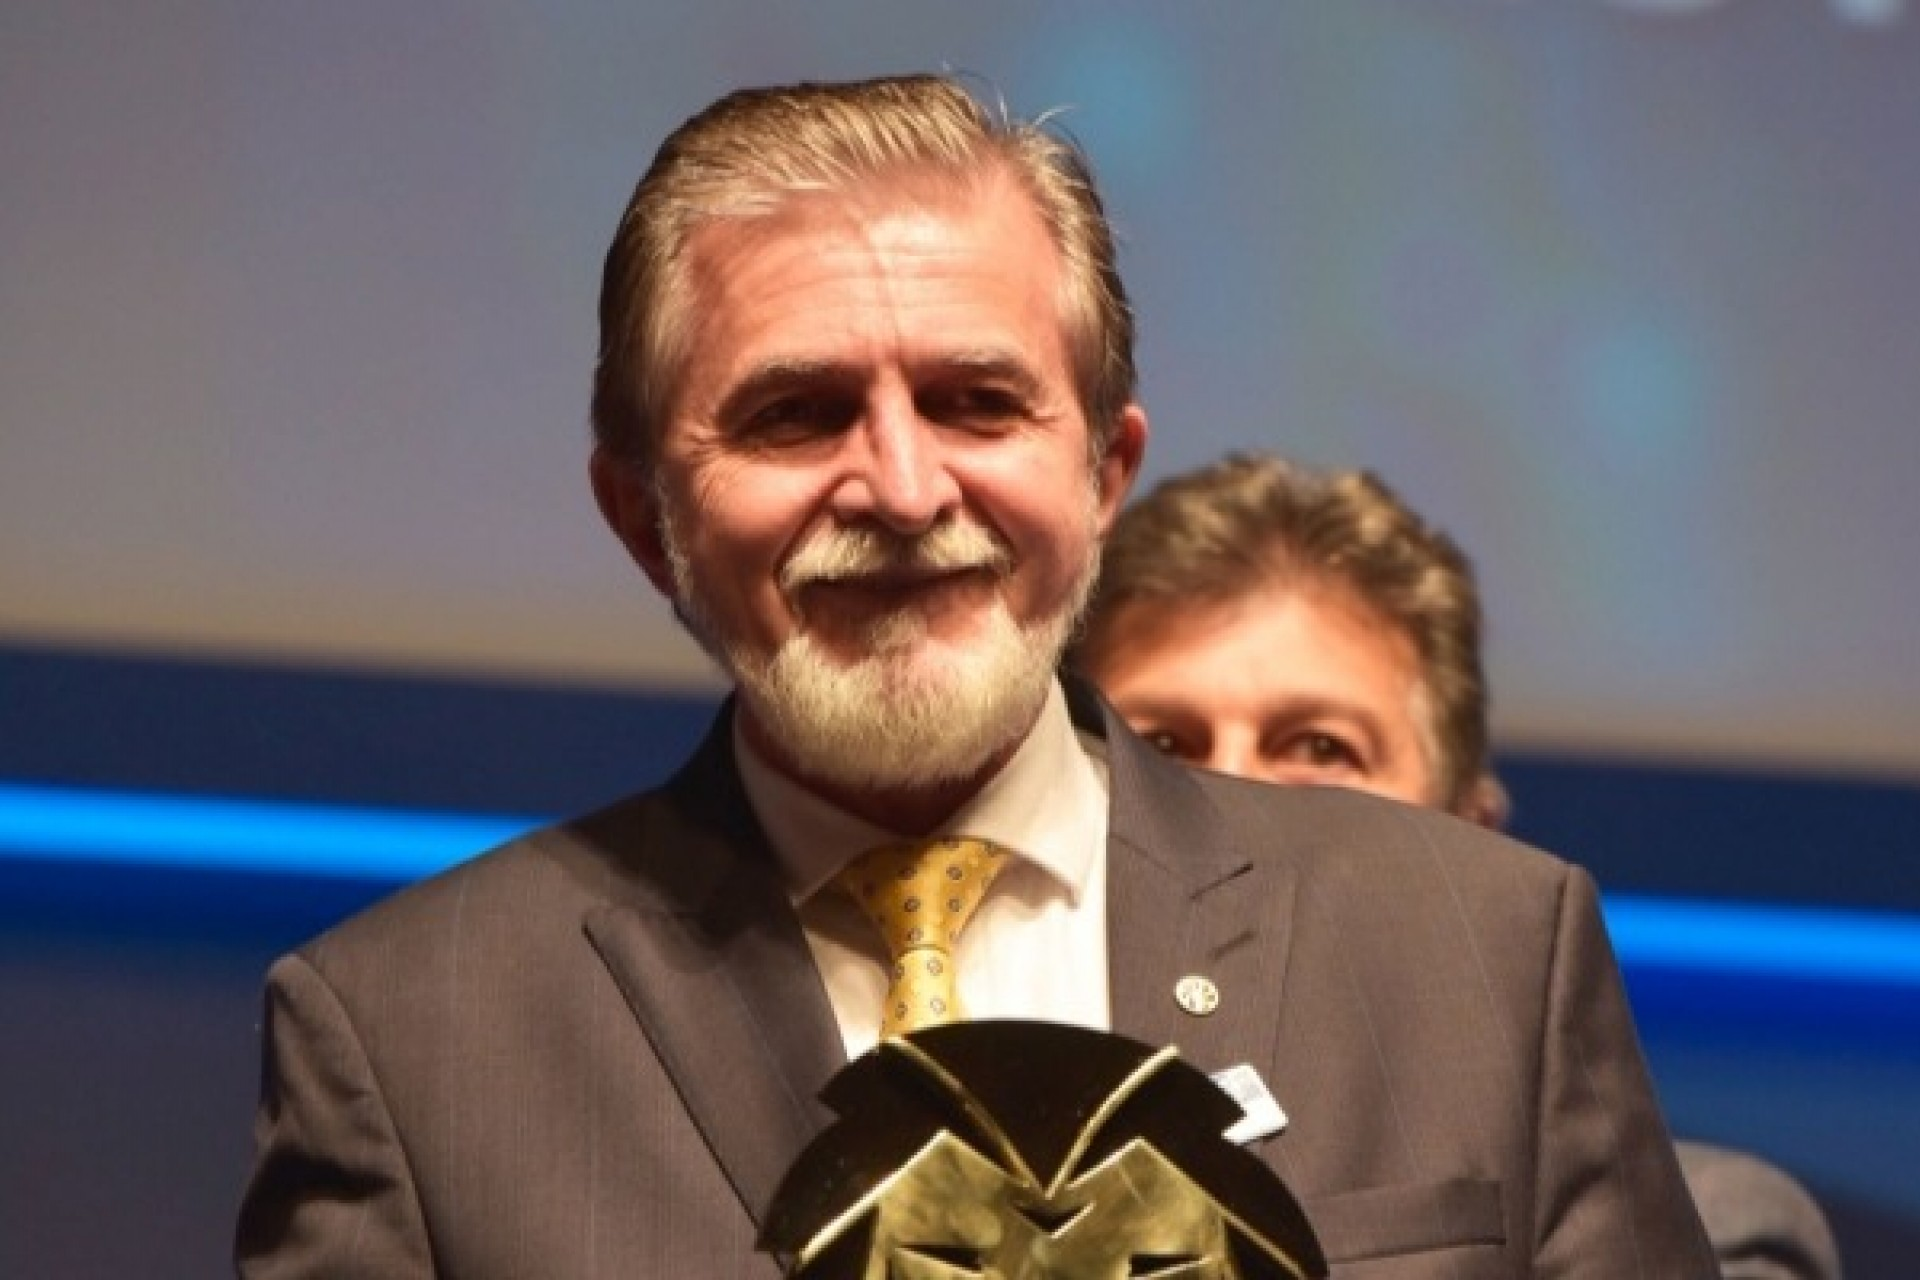 Morre em São Paulo o presidente da Sicredi Vanguarda Luiz Hoflinger